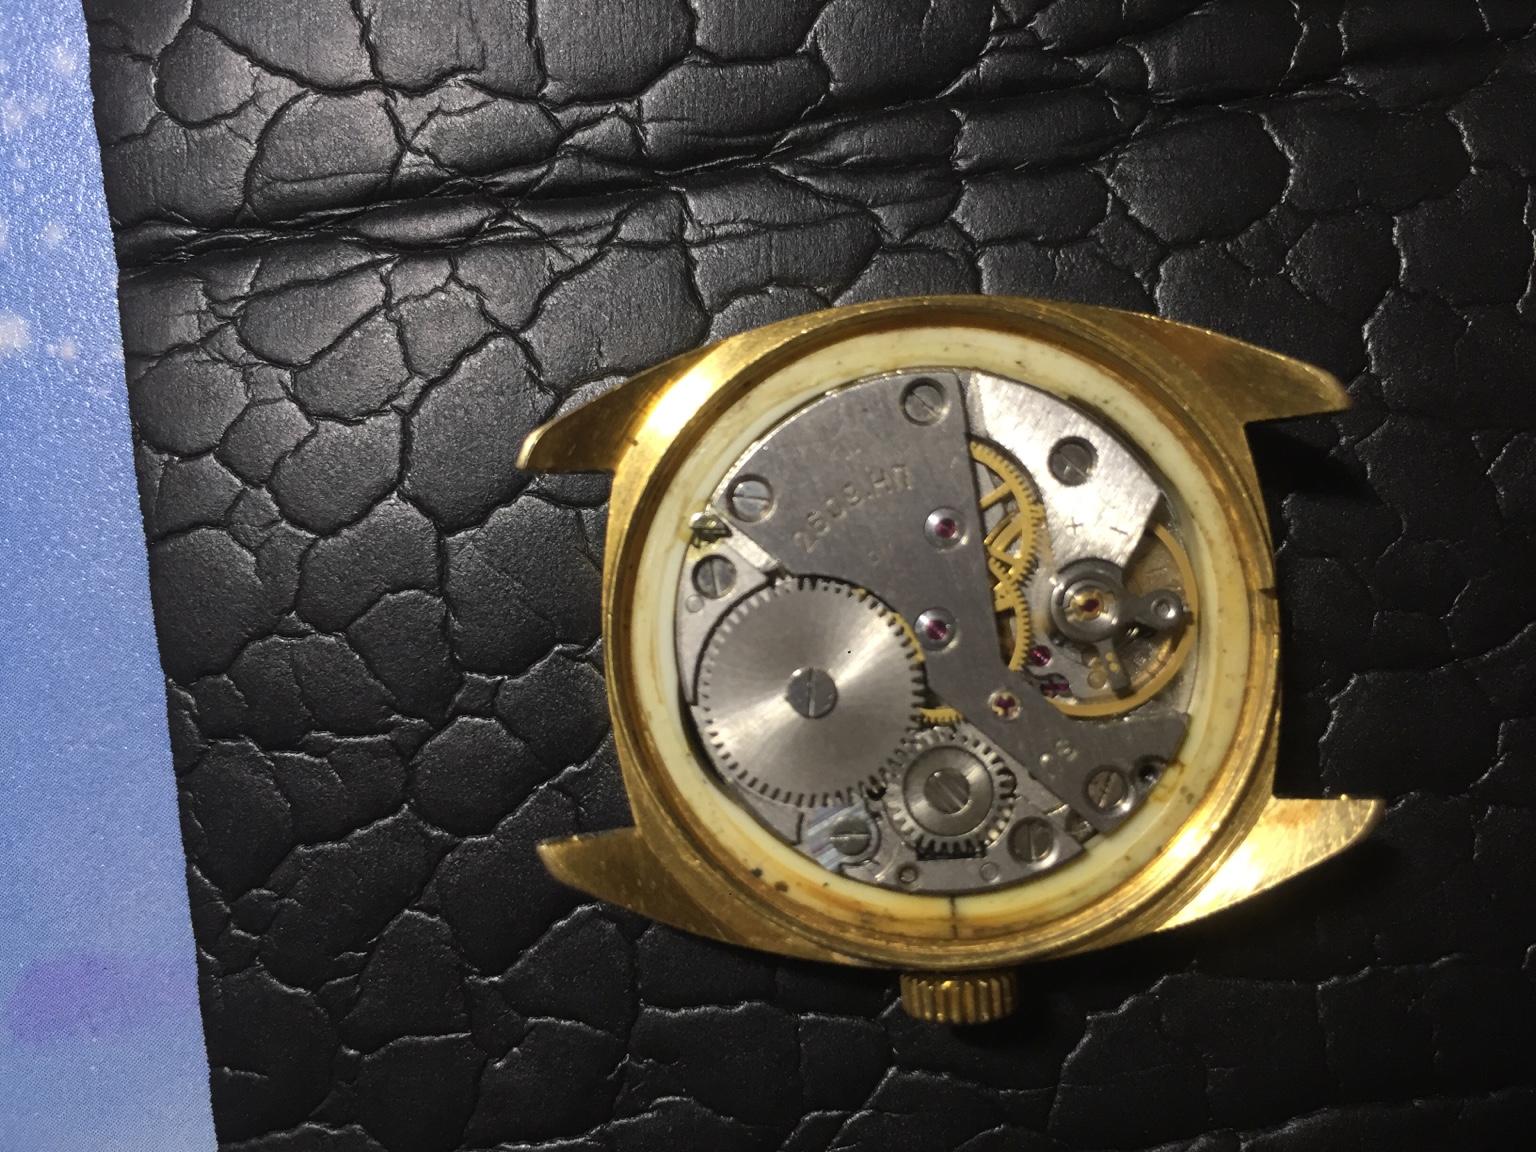 Đồng hồ poljot cổ điển